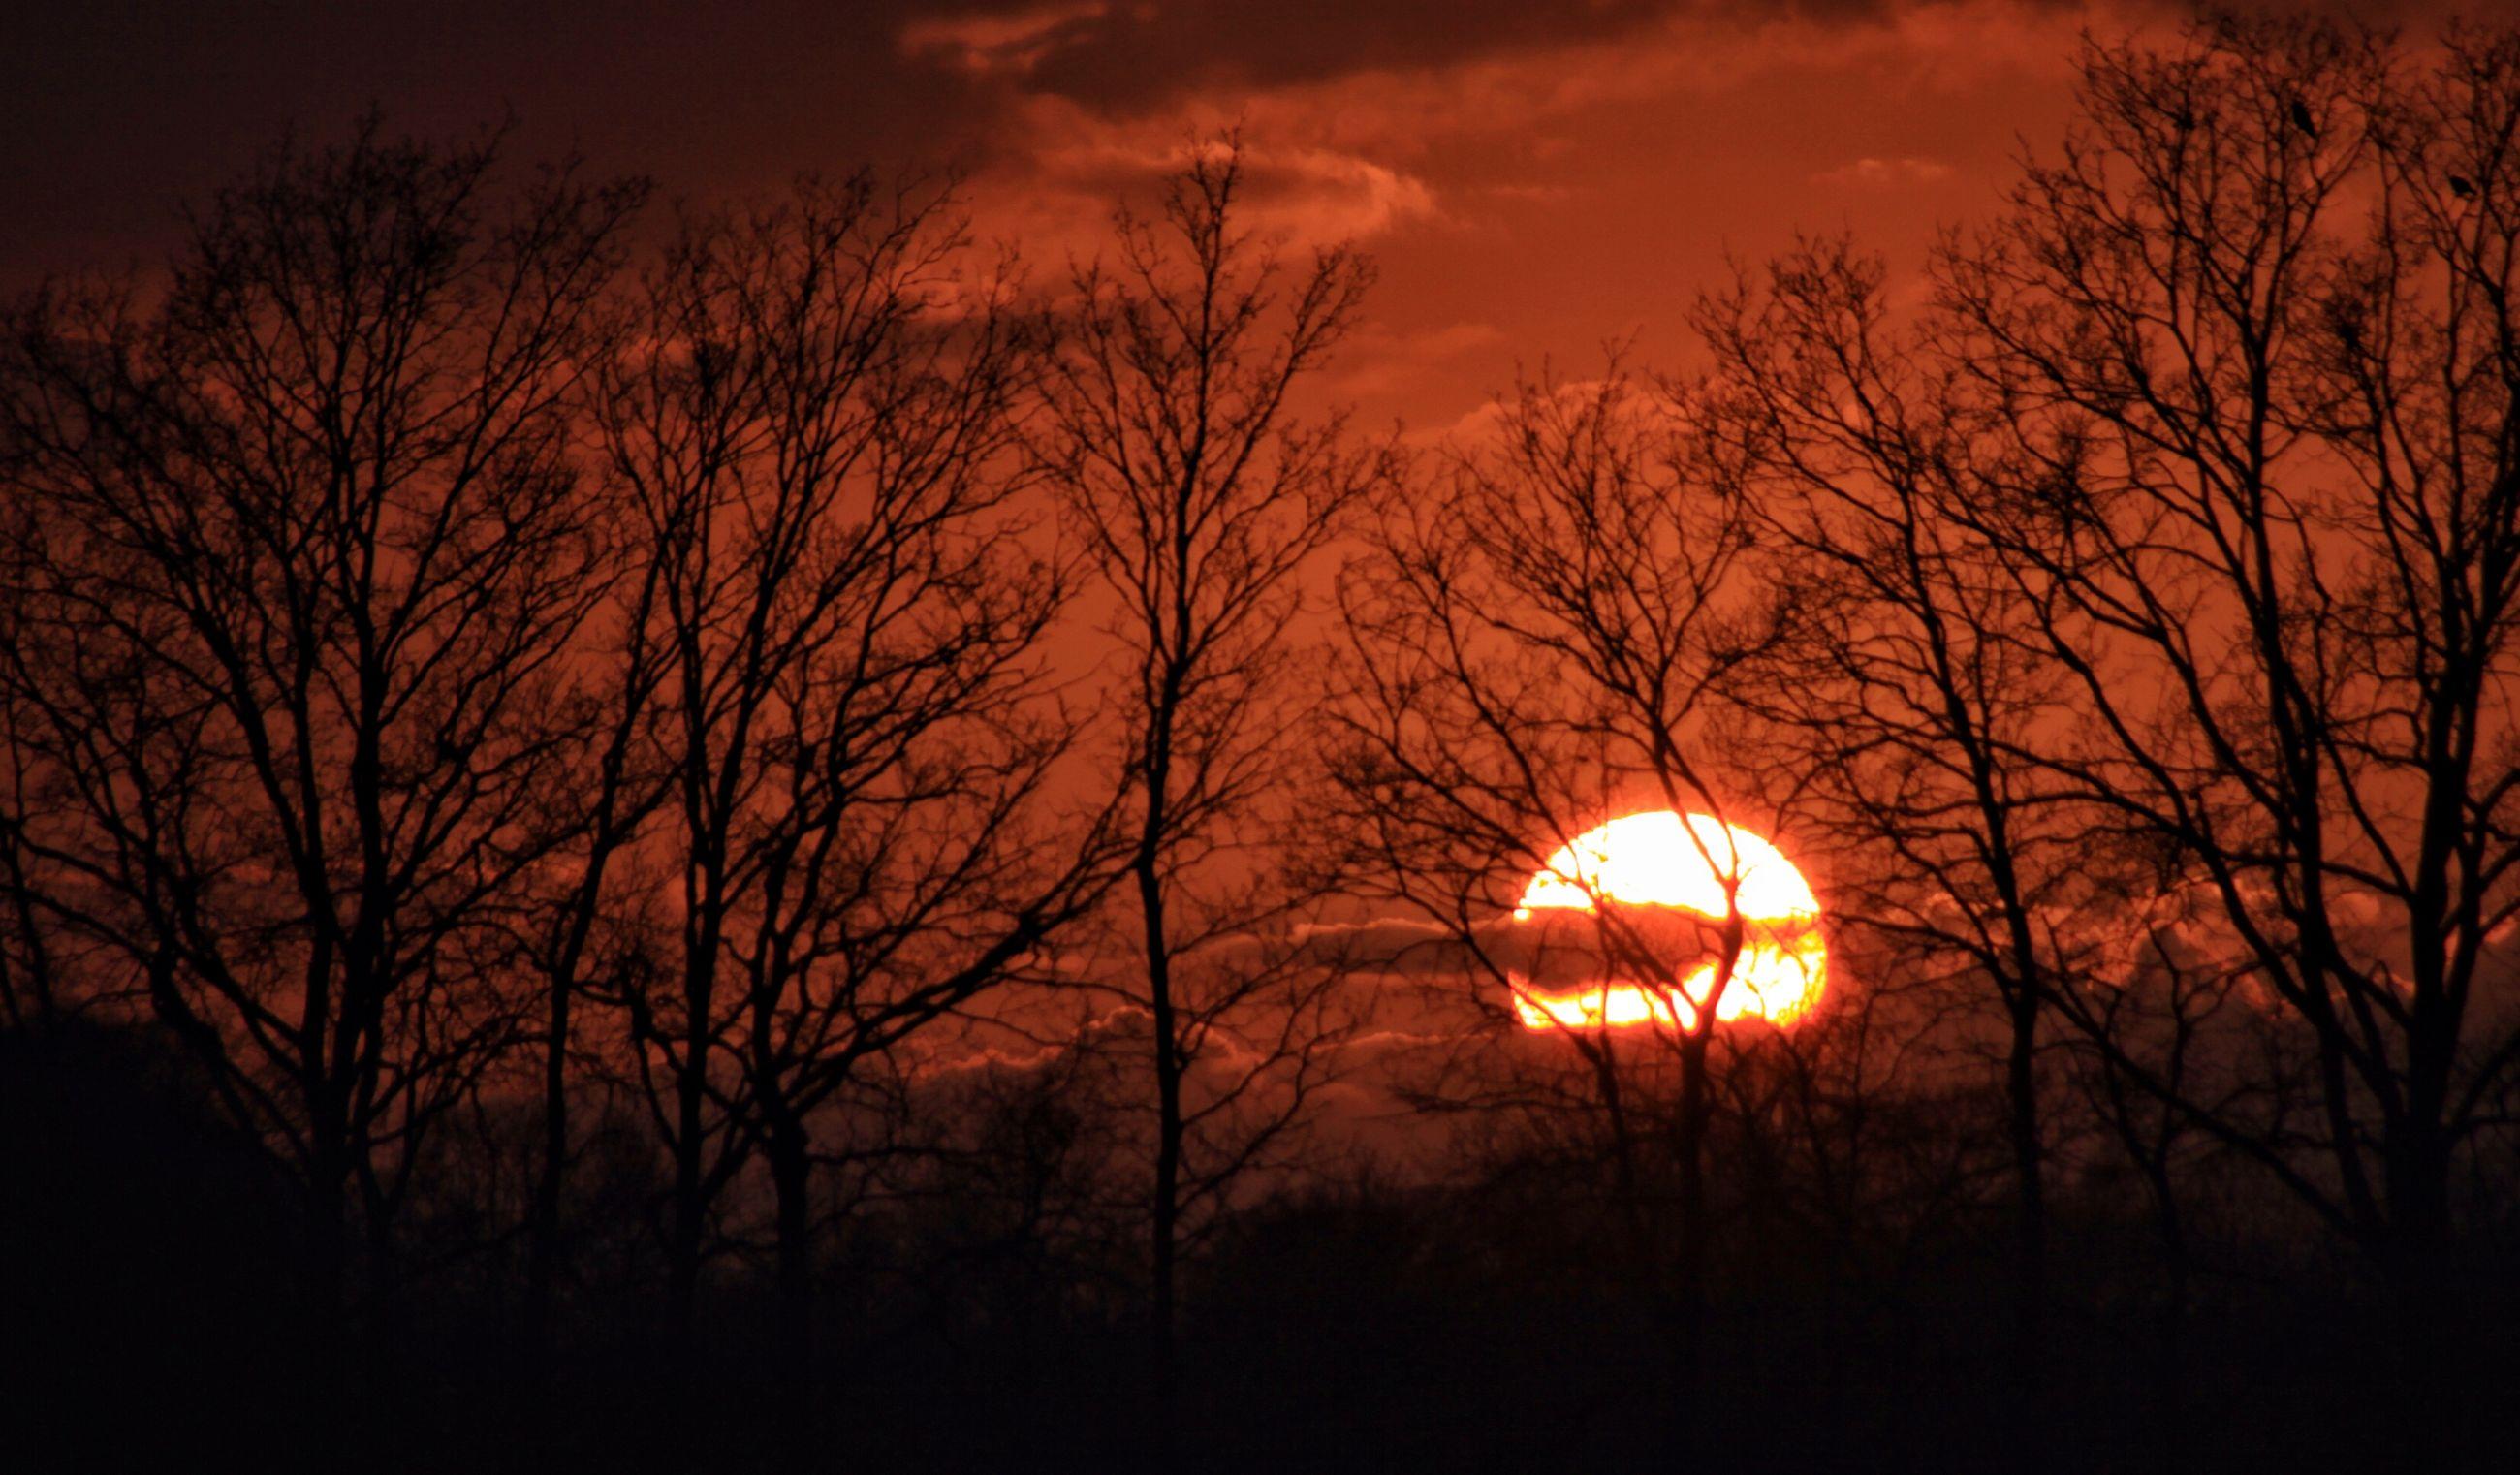 sunset, silhouette, bare tree, orange color, sky, tree, tranquility, beauty in nature, scenics, tranquil scene, cloud - sky, branch, nature, dark, idyllic, sun, dramatic sky, outdoors, landscape, dusk